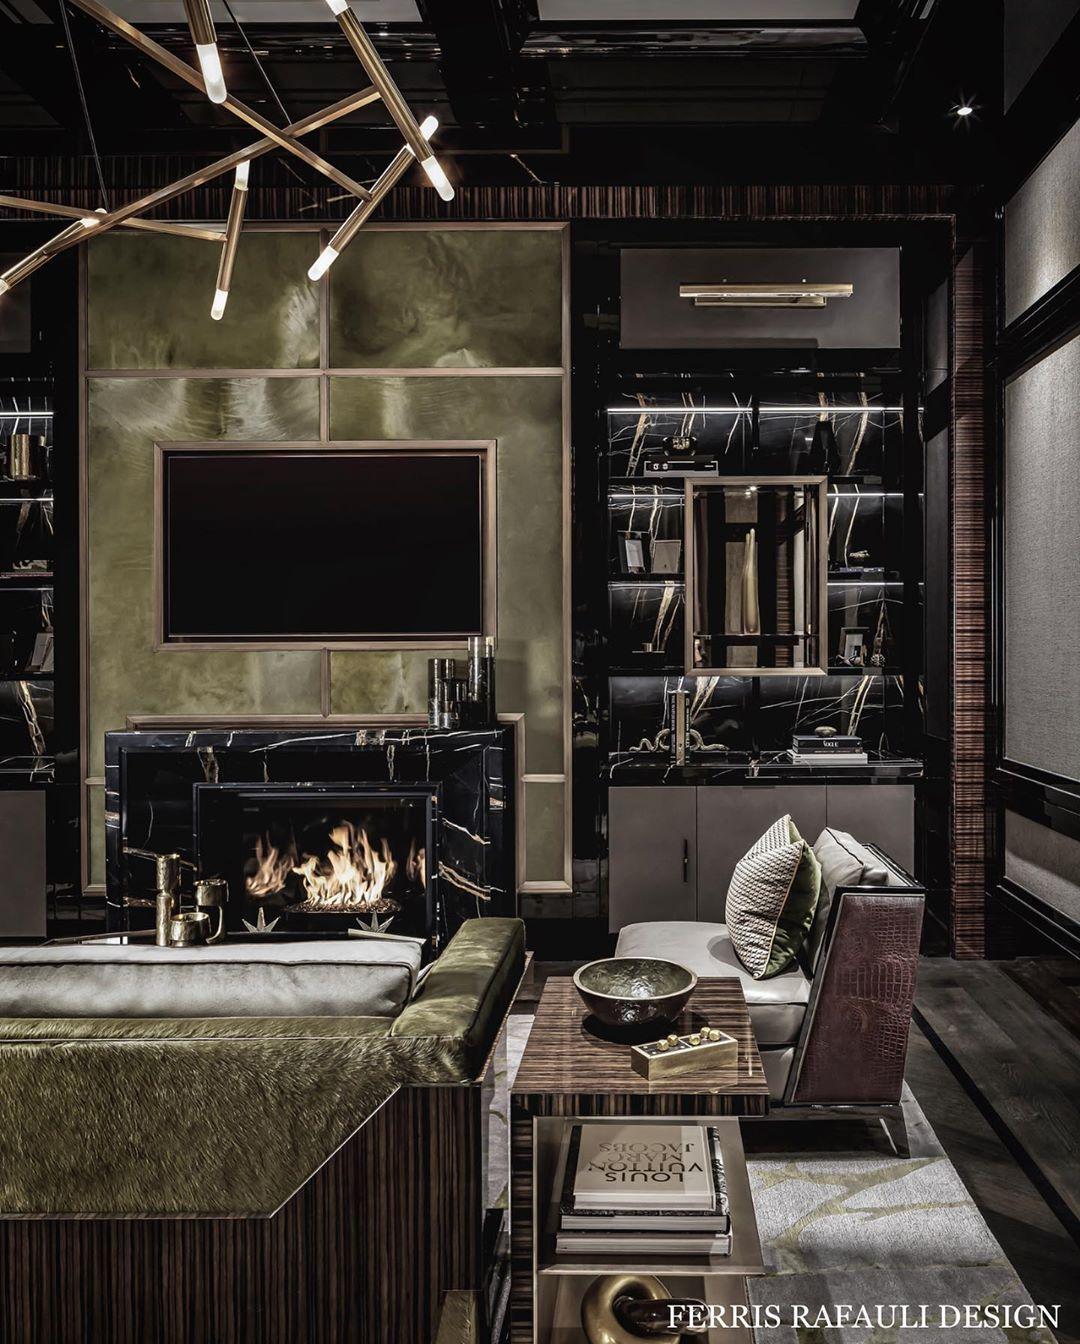 Ferris Rafauli perfectly combines exterior architecture with interior design like a master! #interiortrends #contemporarydesign #interiordesignideas #interiorarchitecture #livingroom